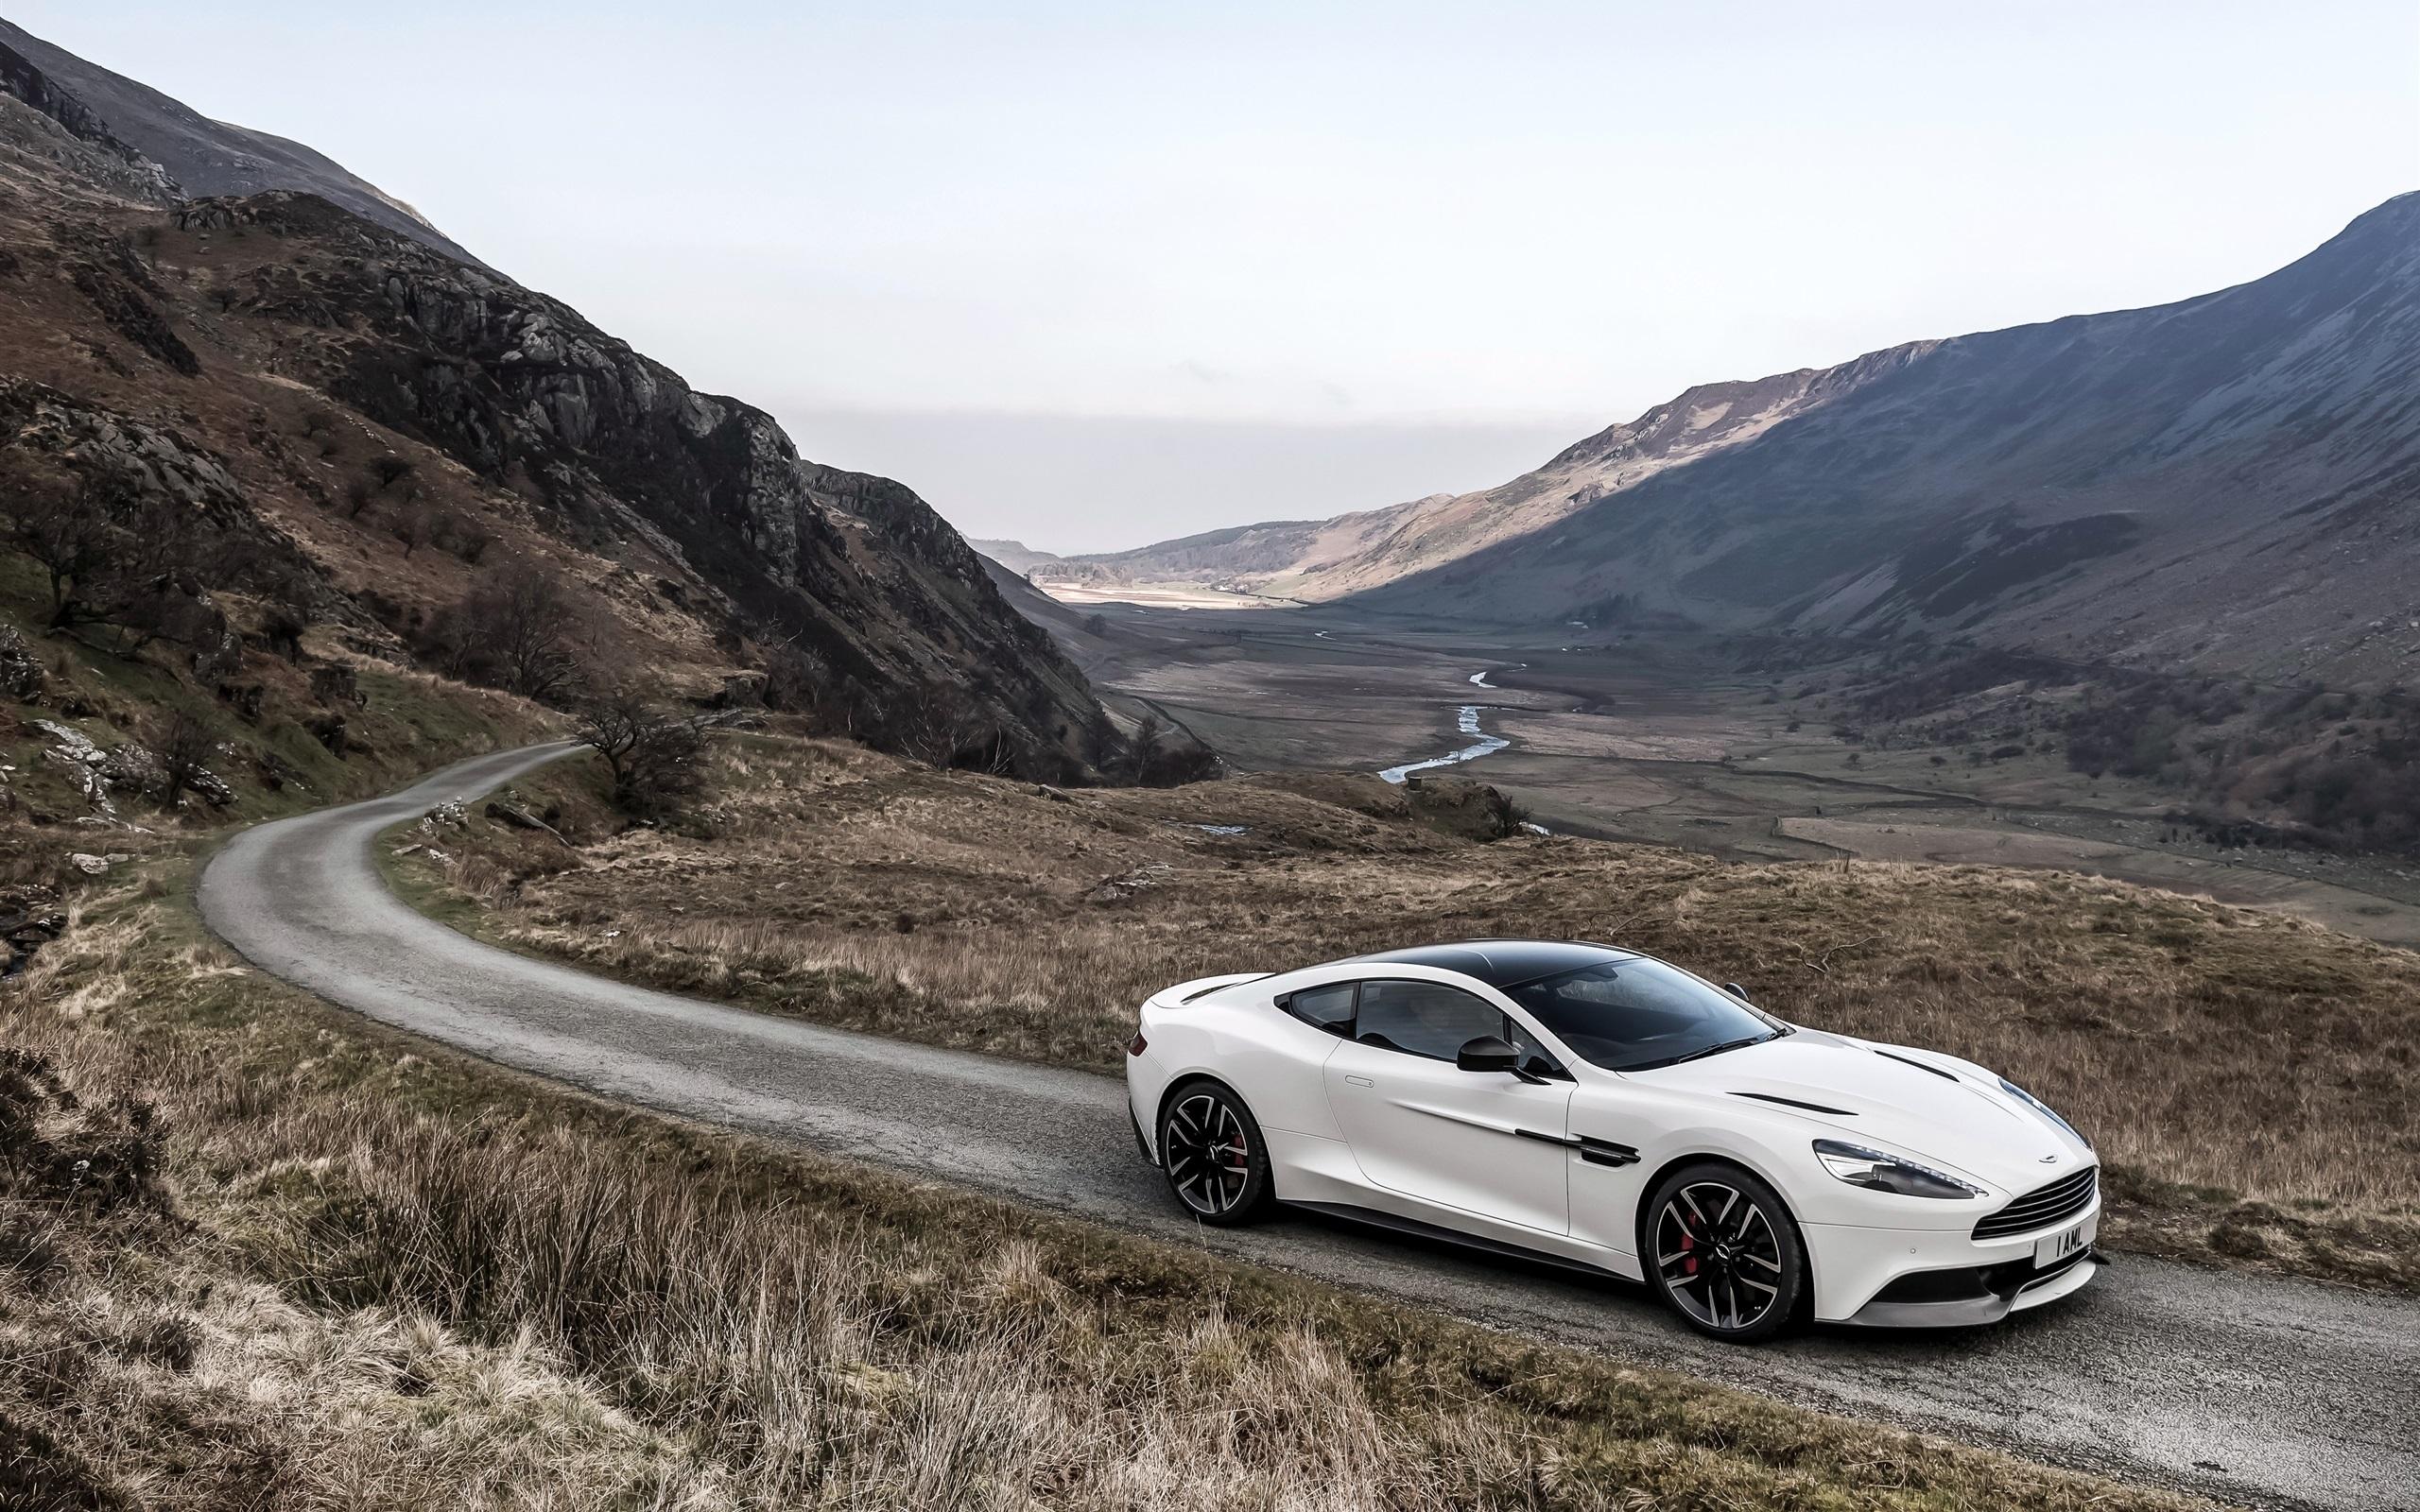 Wallpaper 2014 Aston Martin Vanquish Carbon White Supercar 2560x1600 Hd Picture Image